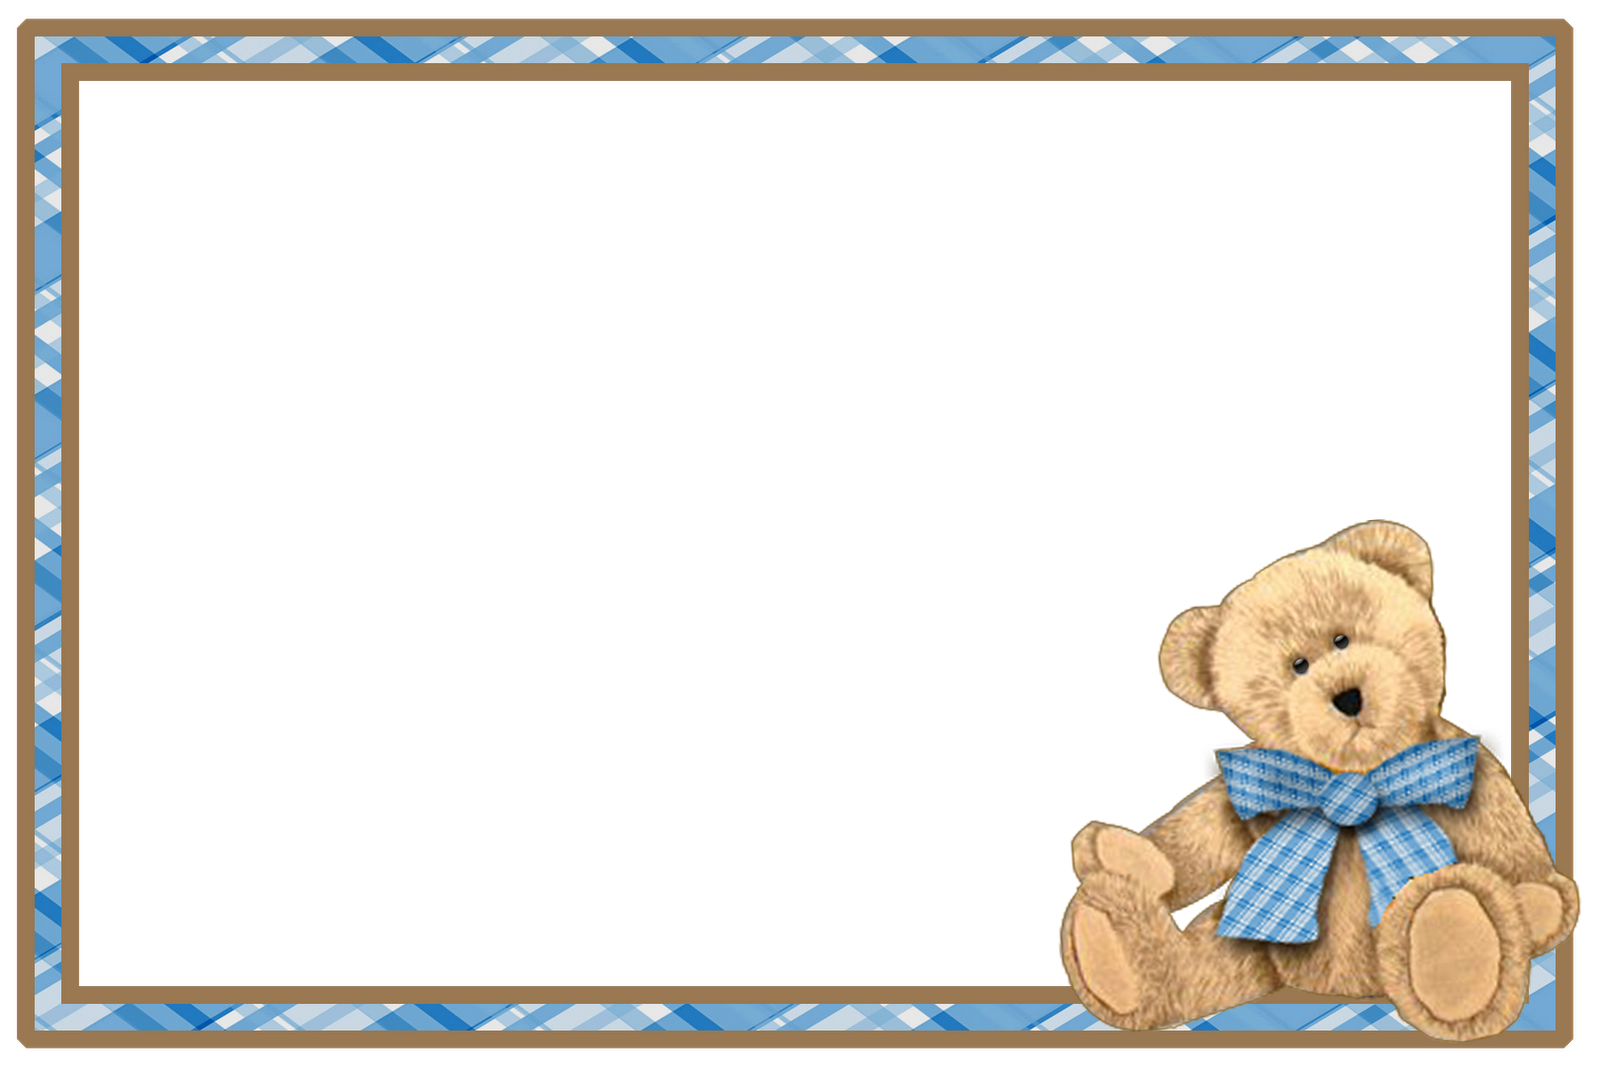 Granny Enchanted S Blog Free Teddy Bear Digi Scrapbook Kit